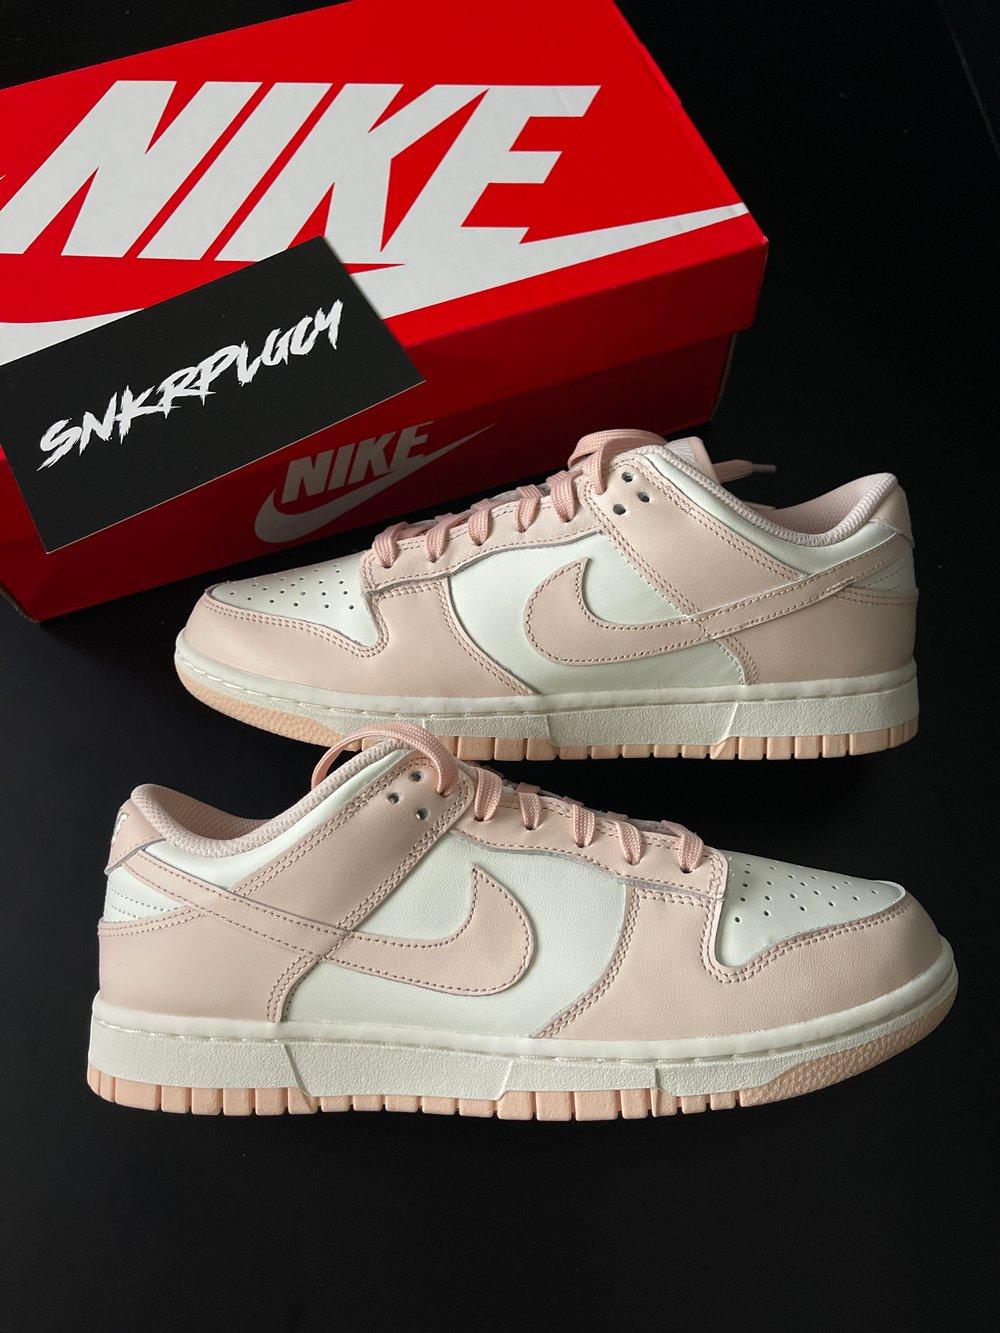 Nike Dunk Low / Sail - Orange Pearl